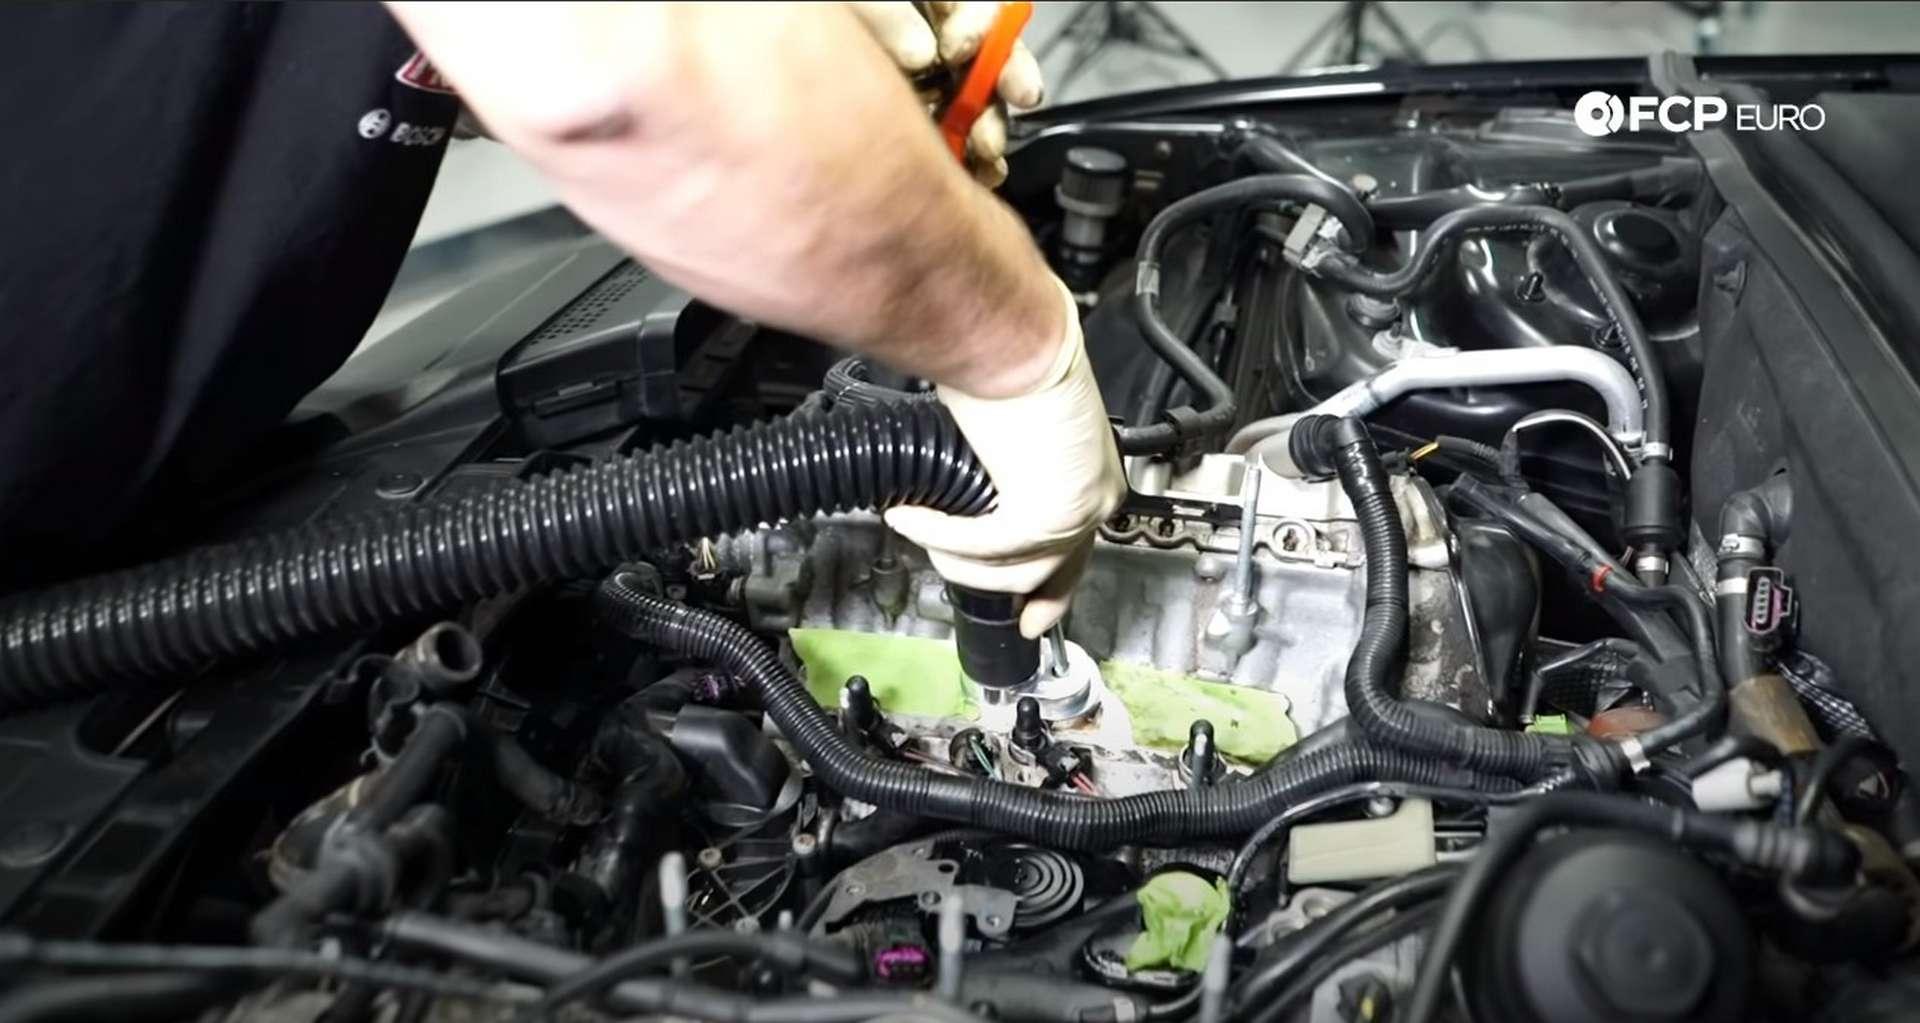 How To Walnut Blast Intake Valves On An Audi 3.0t Engine